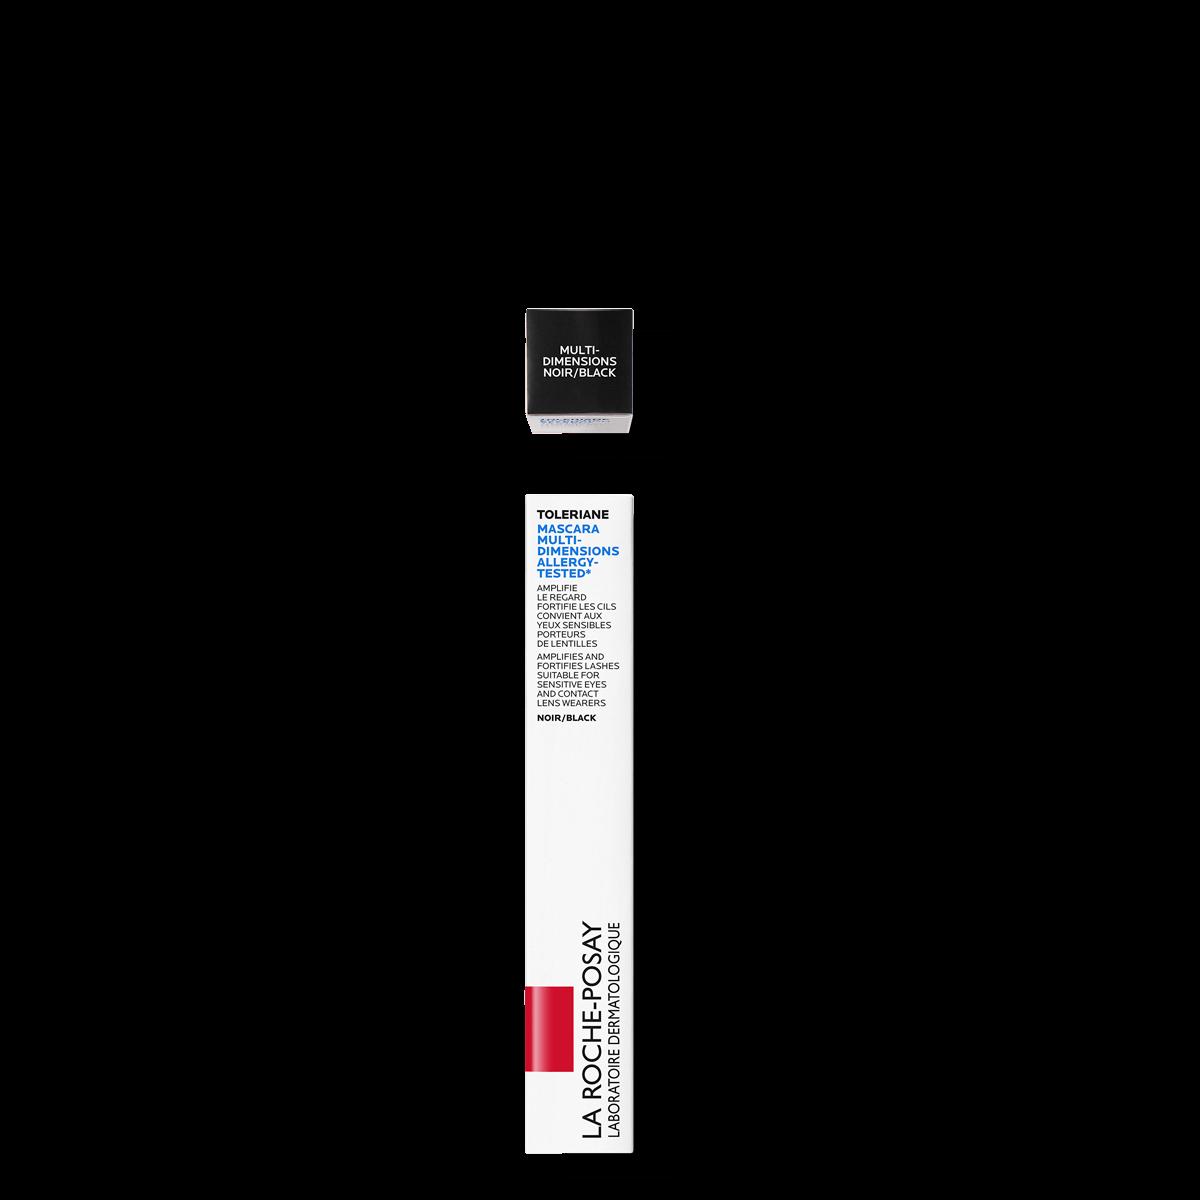 La Roche Posay Känslig Toleriane Make up MULTIDIMENSIONS MASCARA Black